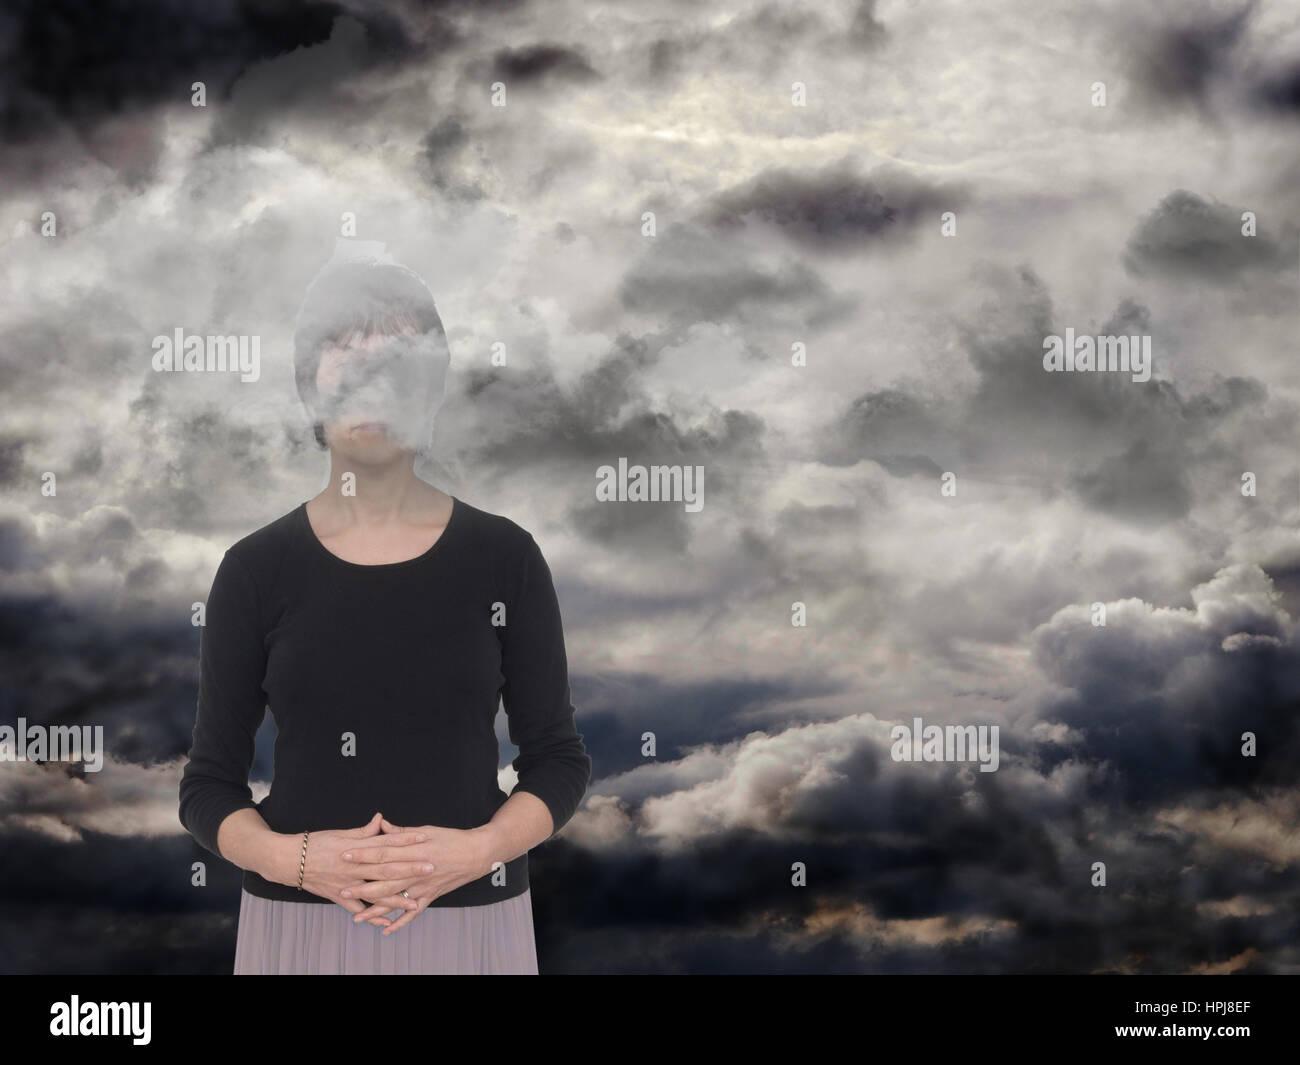 Frau in einem dunklen Raum, graue Wolken. Depression, Angst-Konzept, Metapher. Stockbild